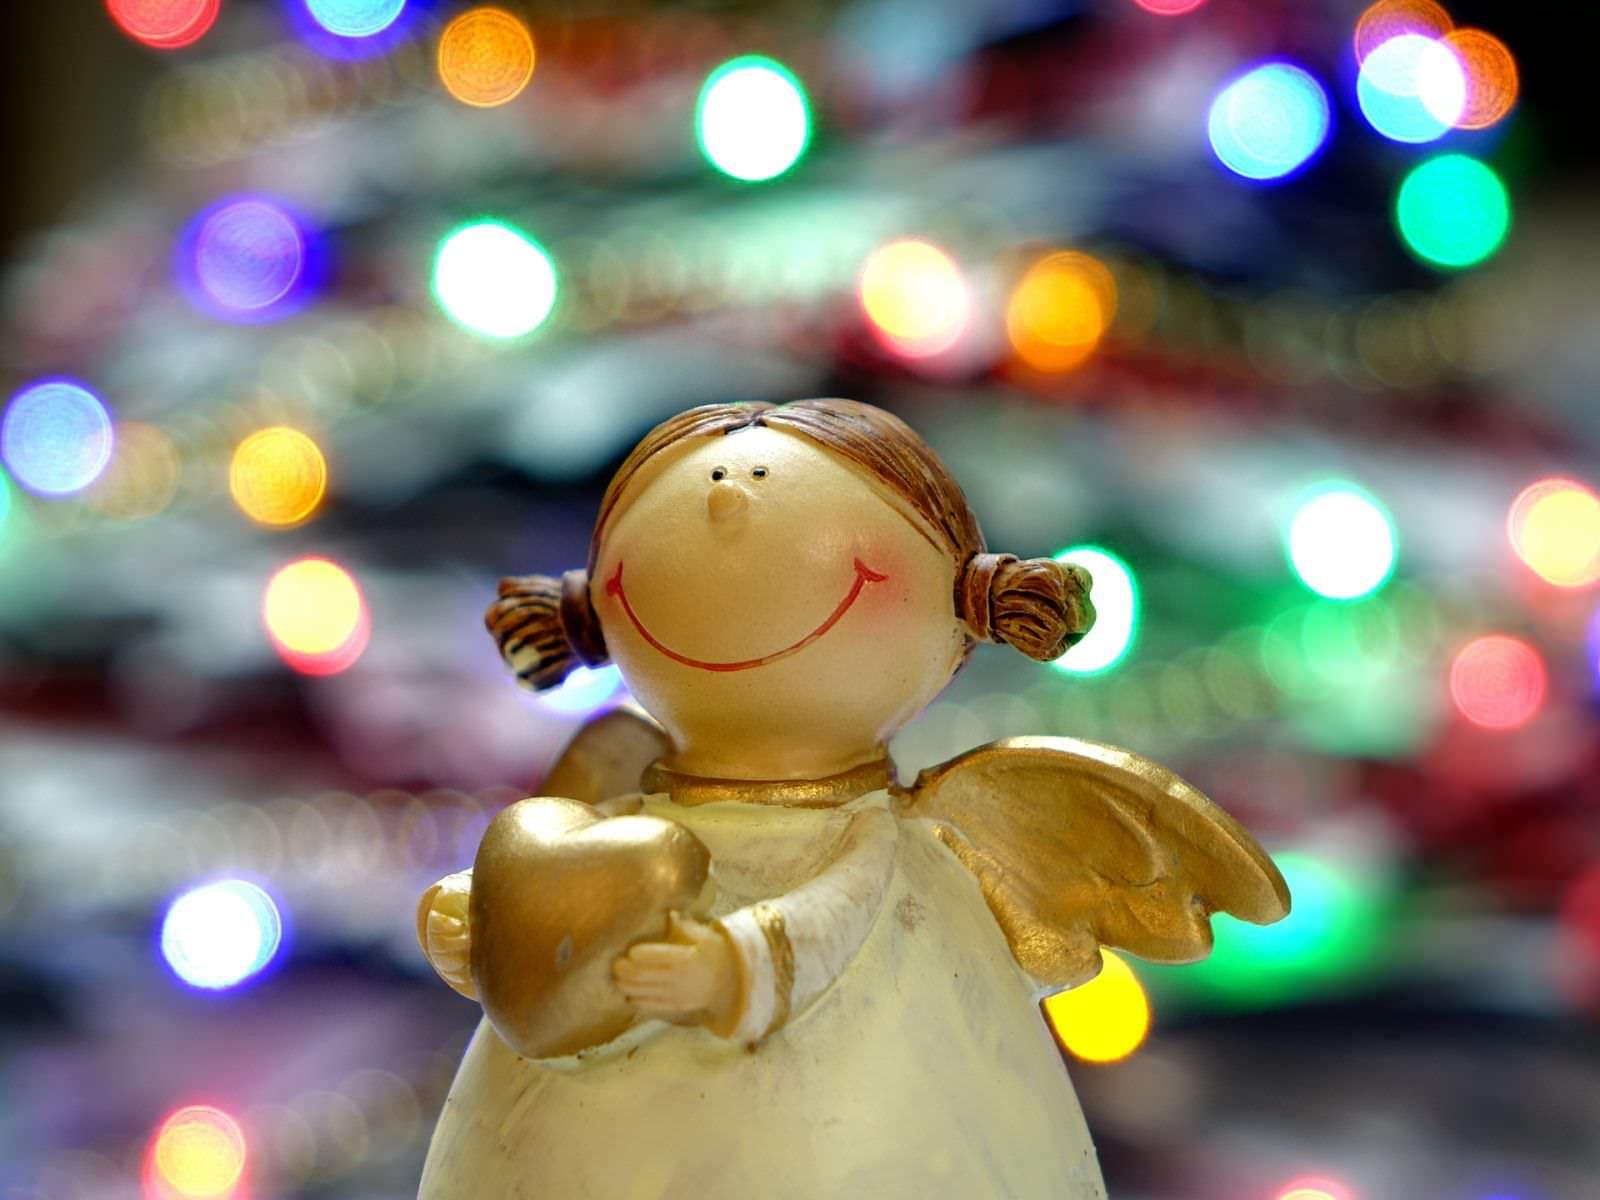 Weihnachten in den Niederlanden | groningen-info.de